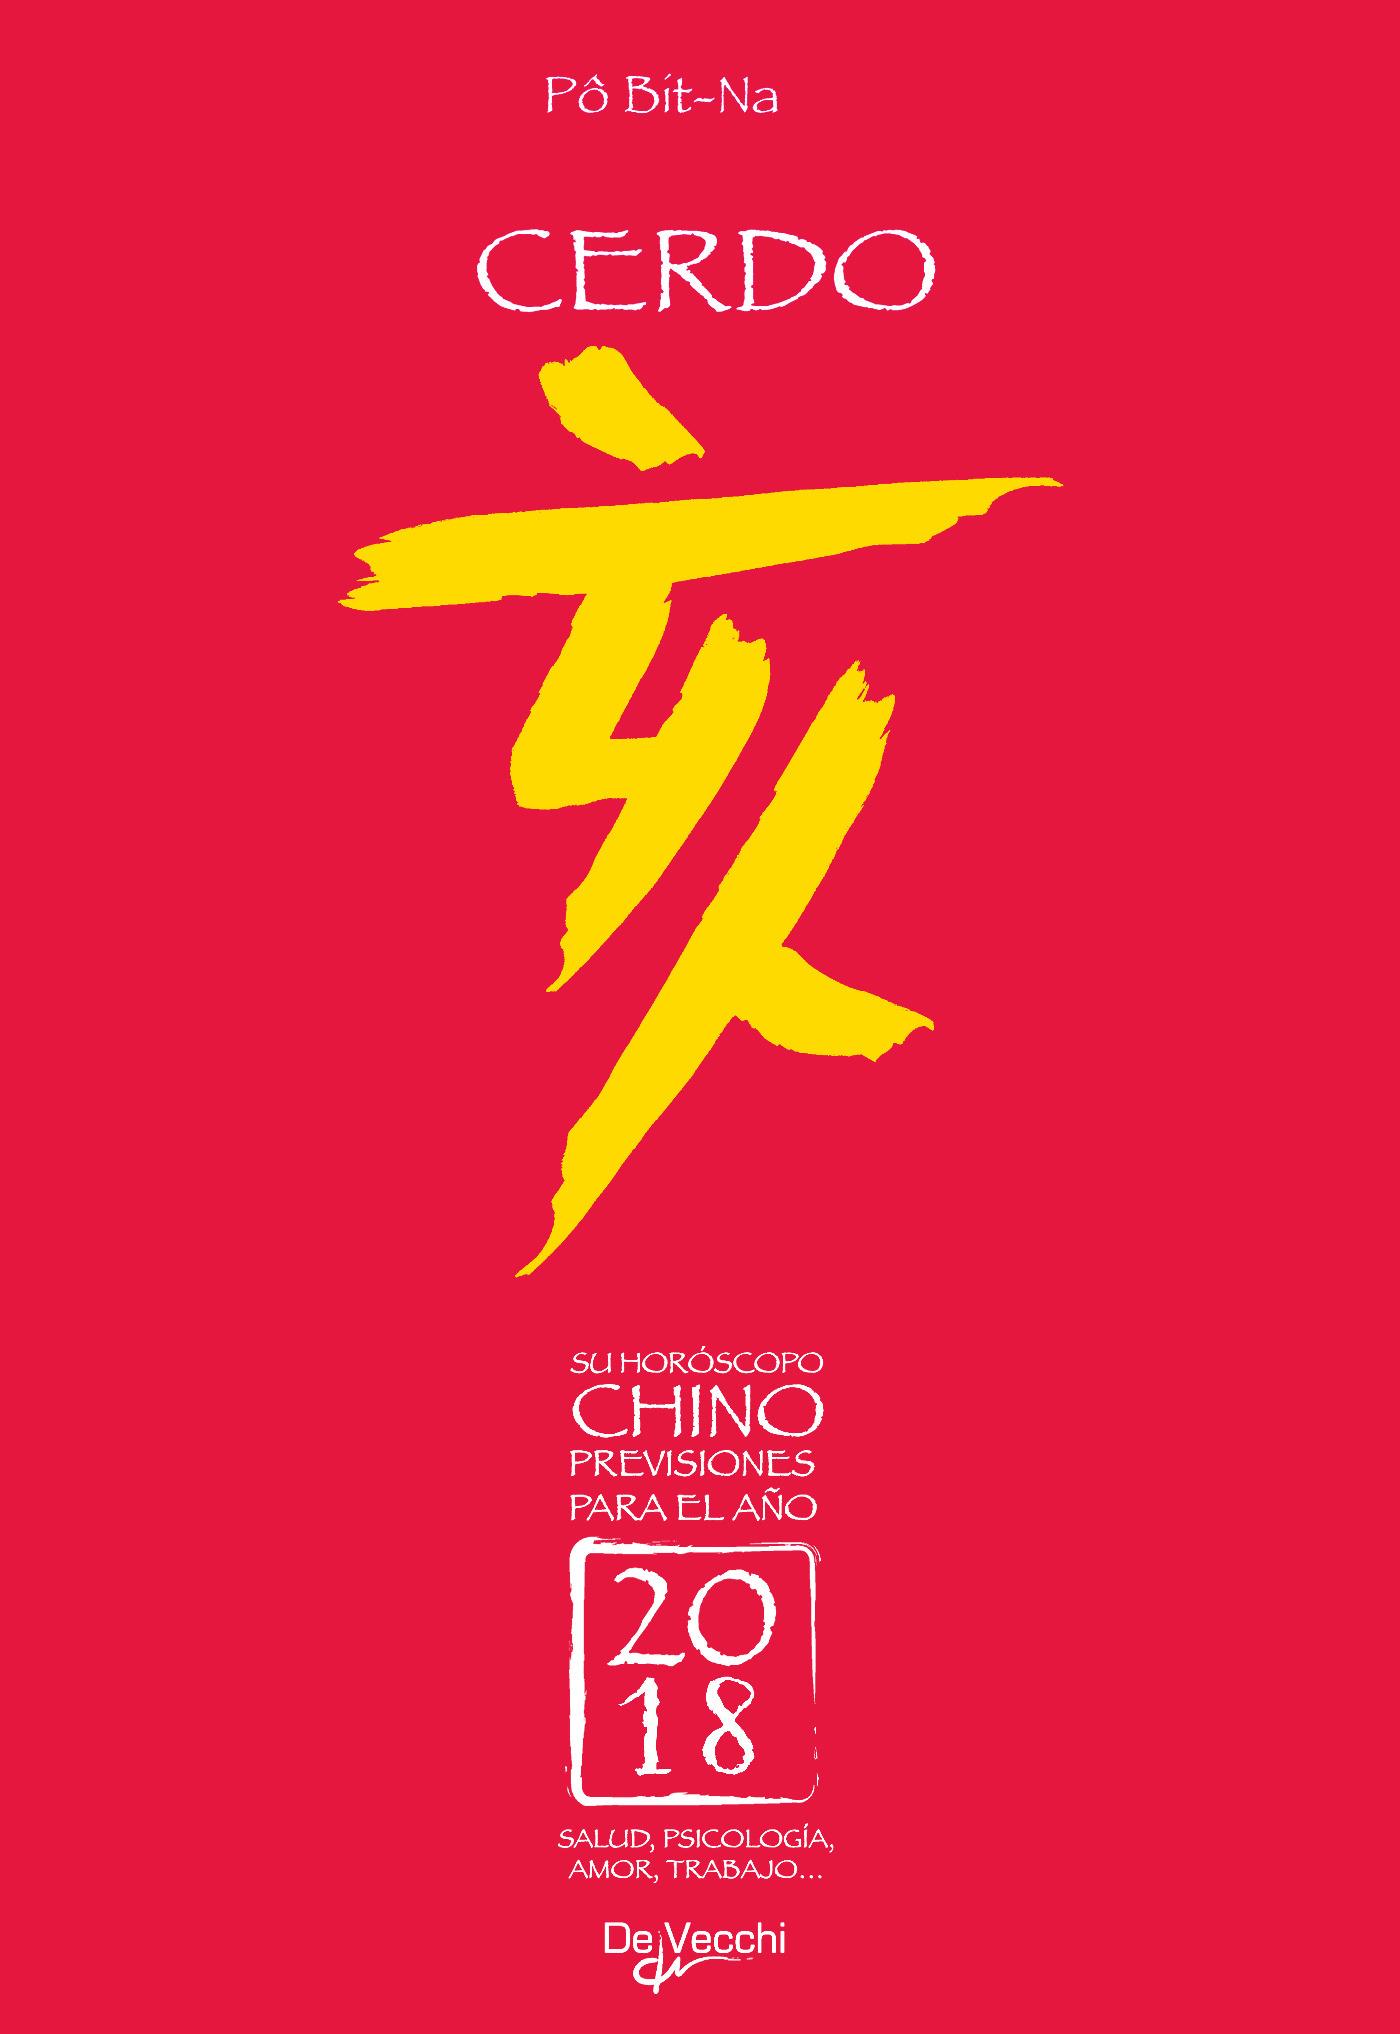 Bit-Na, Pô - Su horóscopo chino. Cerdo, ebook